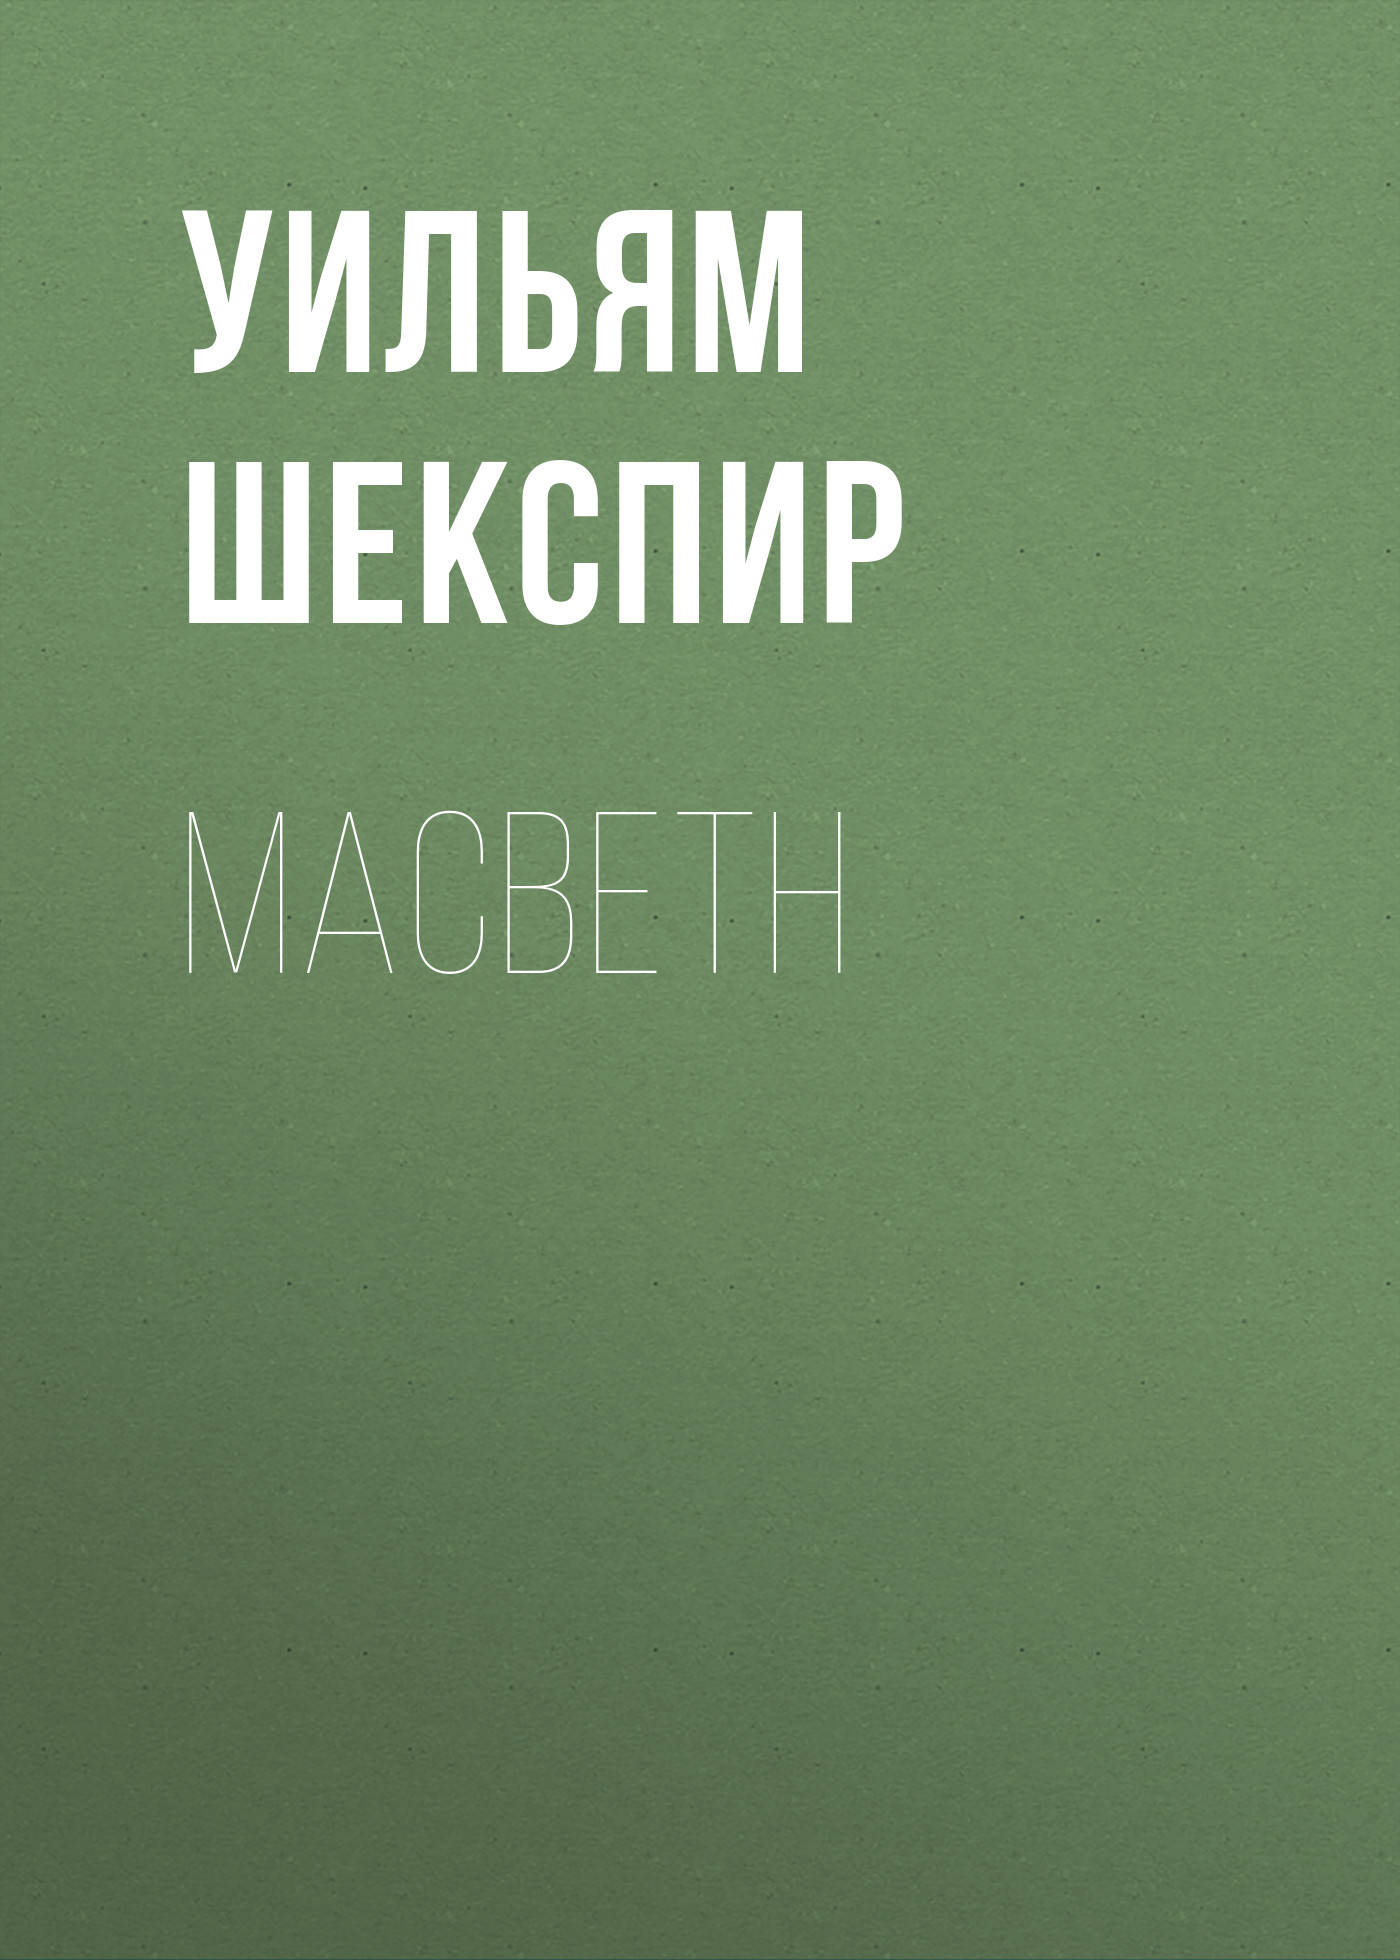 Уильям Шекспир Macbeth цена и фото